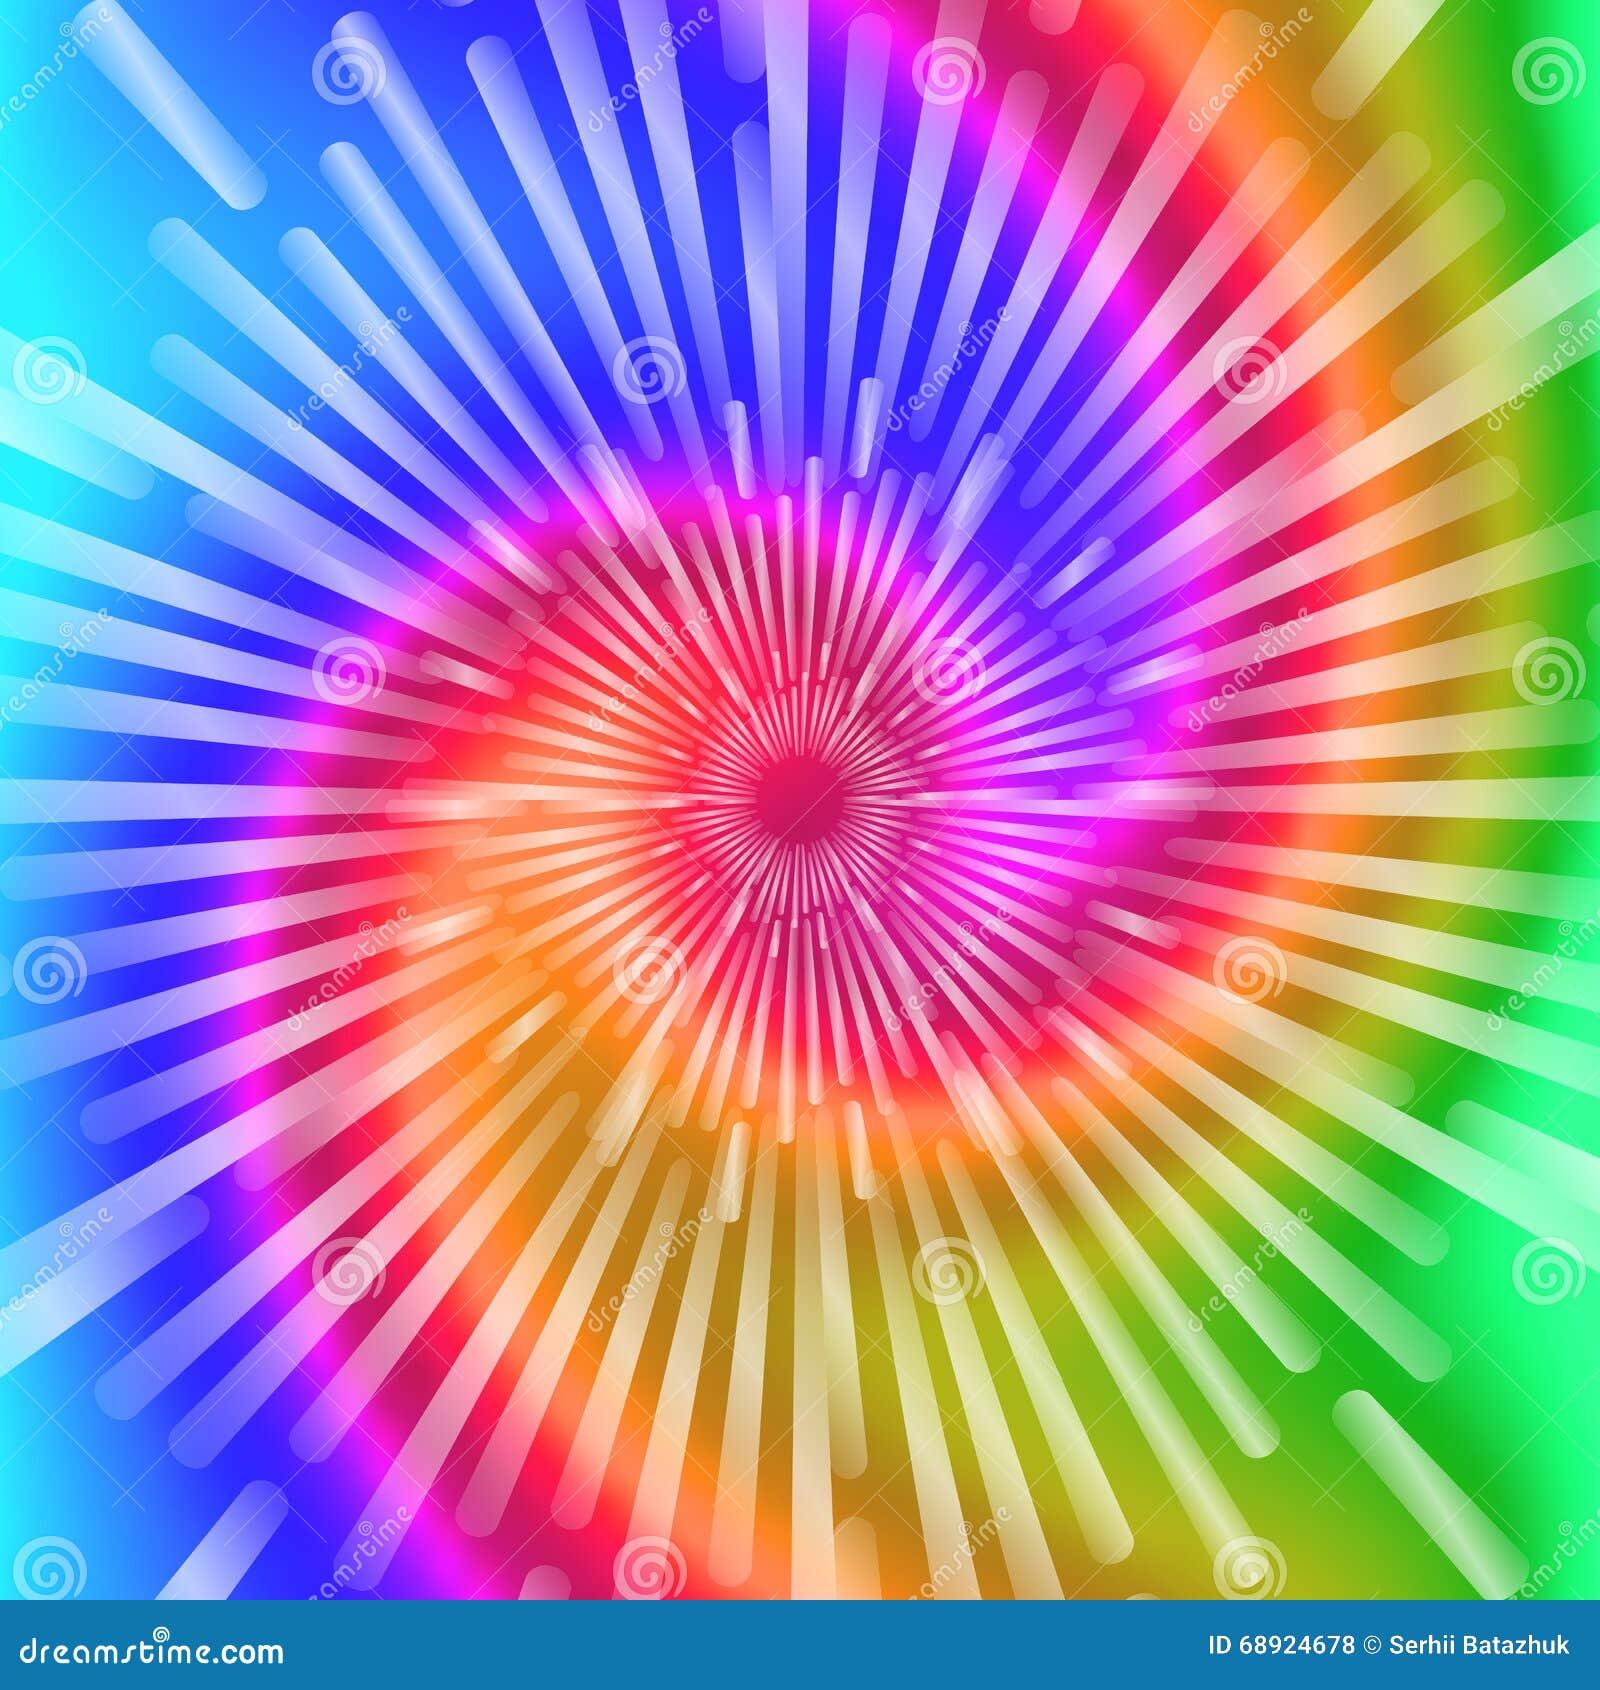 Tie Dye Colors Beautiful Realistic Spiral Tie Dye Vector